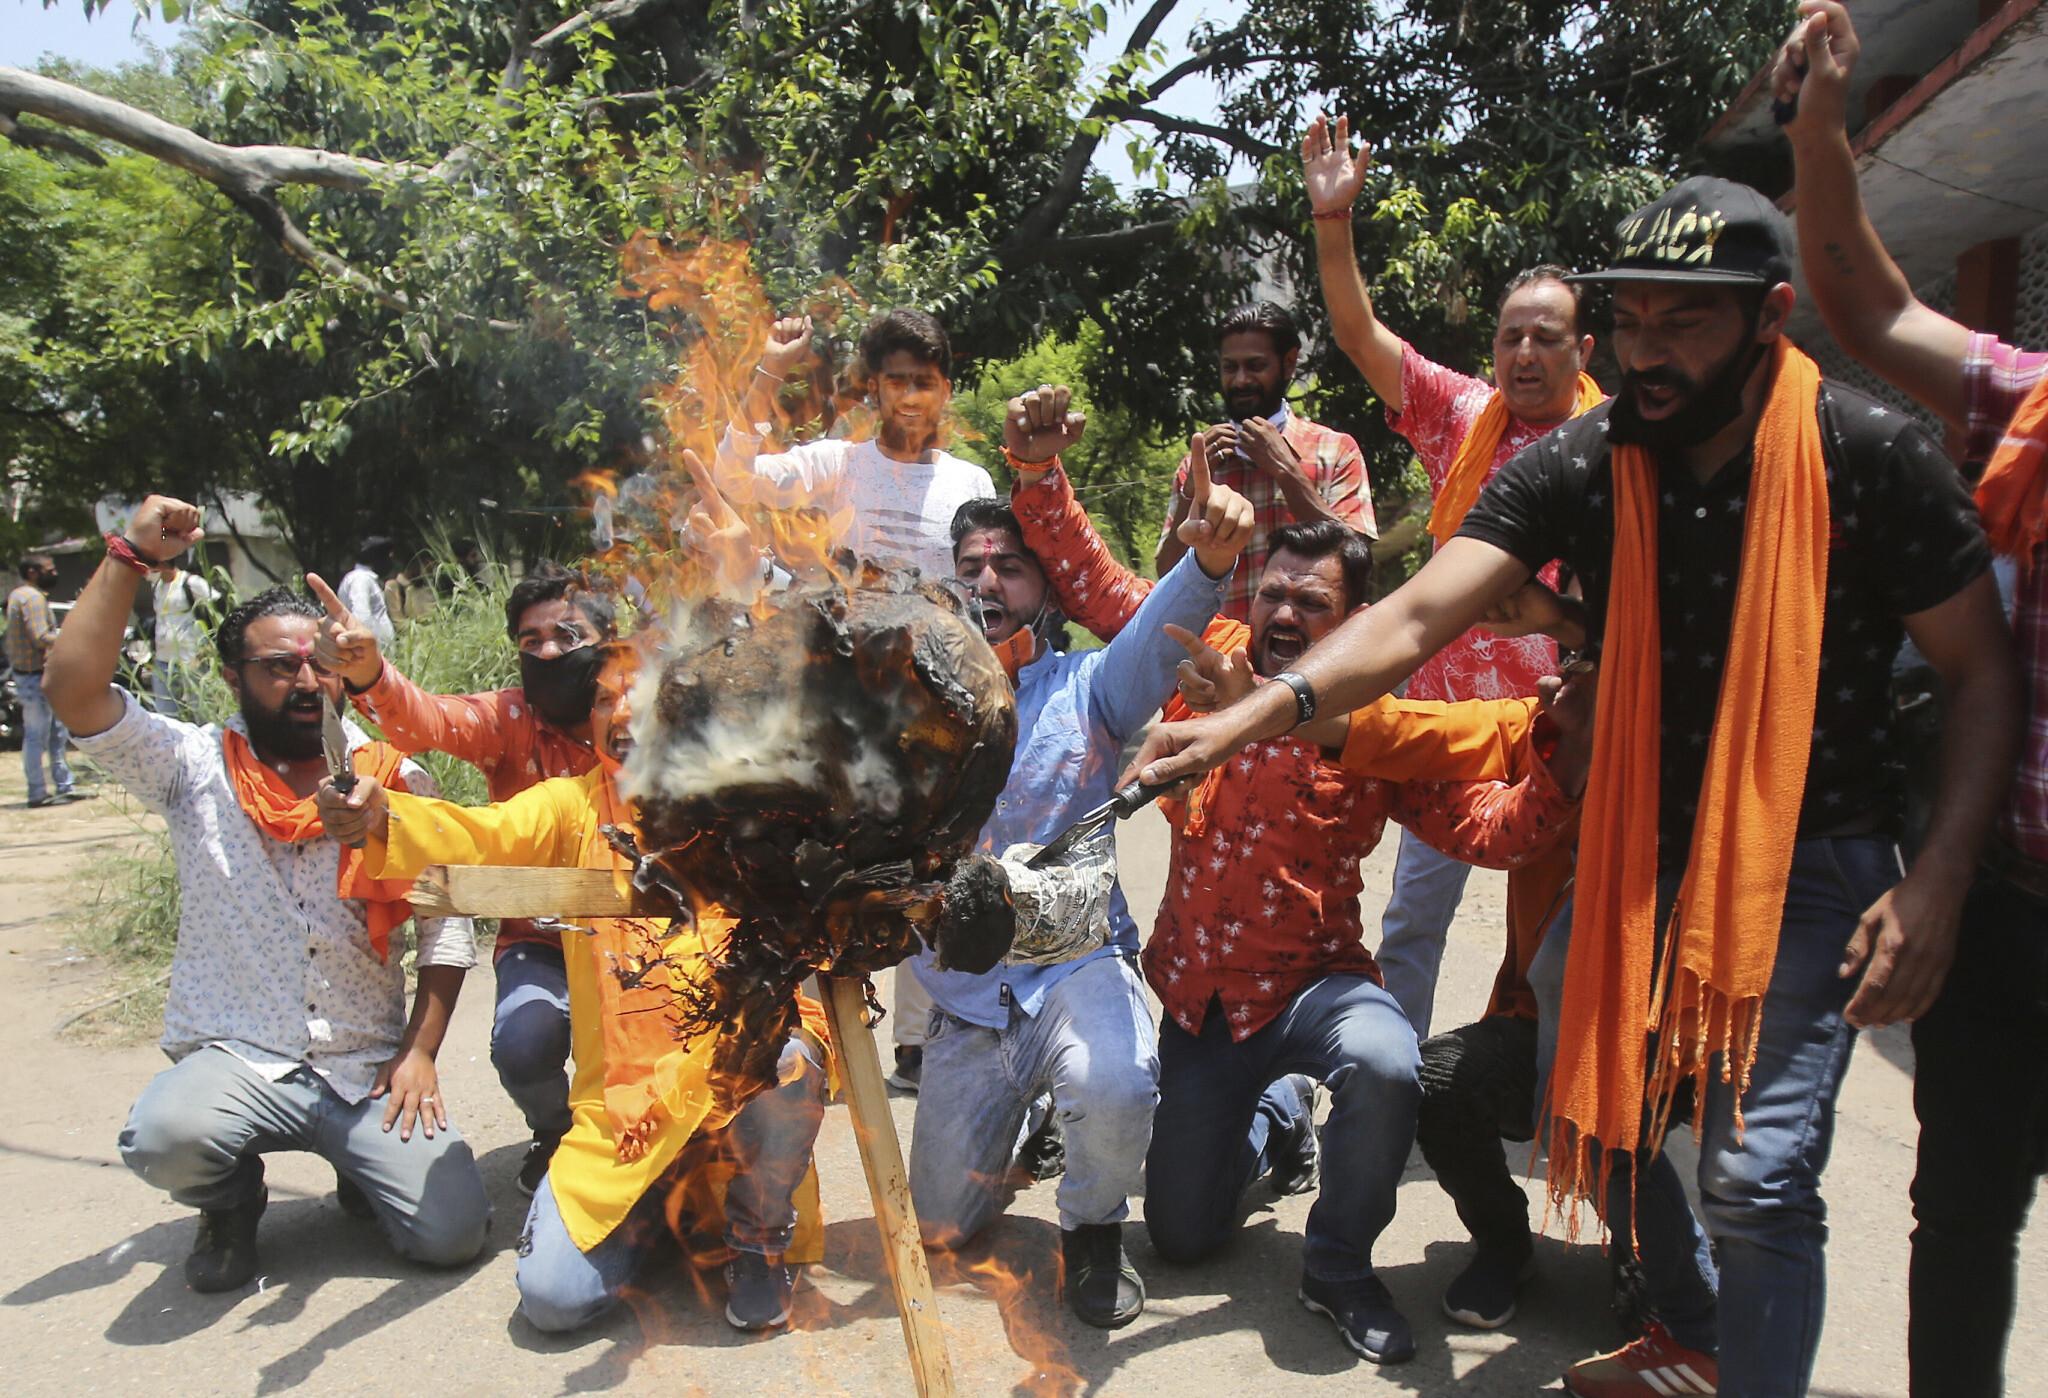 China-India border: Beijing wants 'no more clashes'